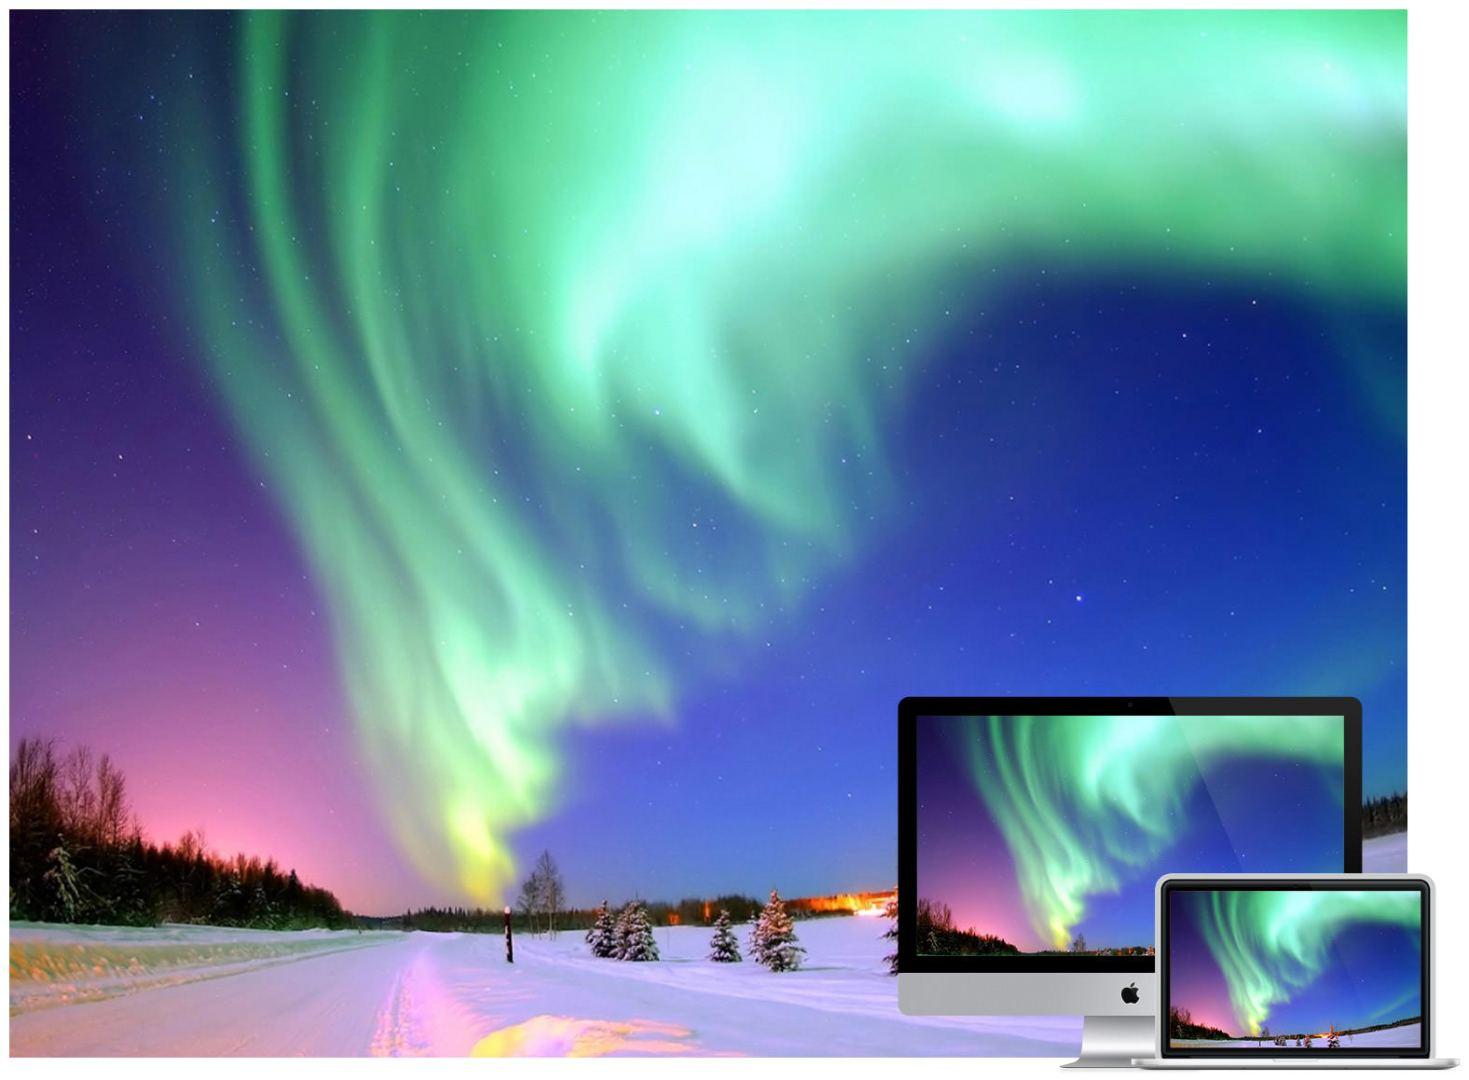 aurora-borealis-desktop-landscape